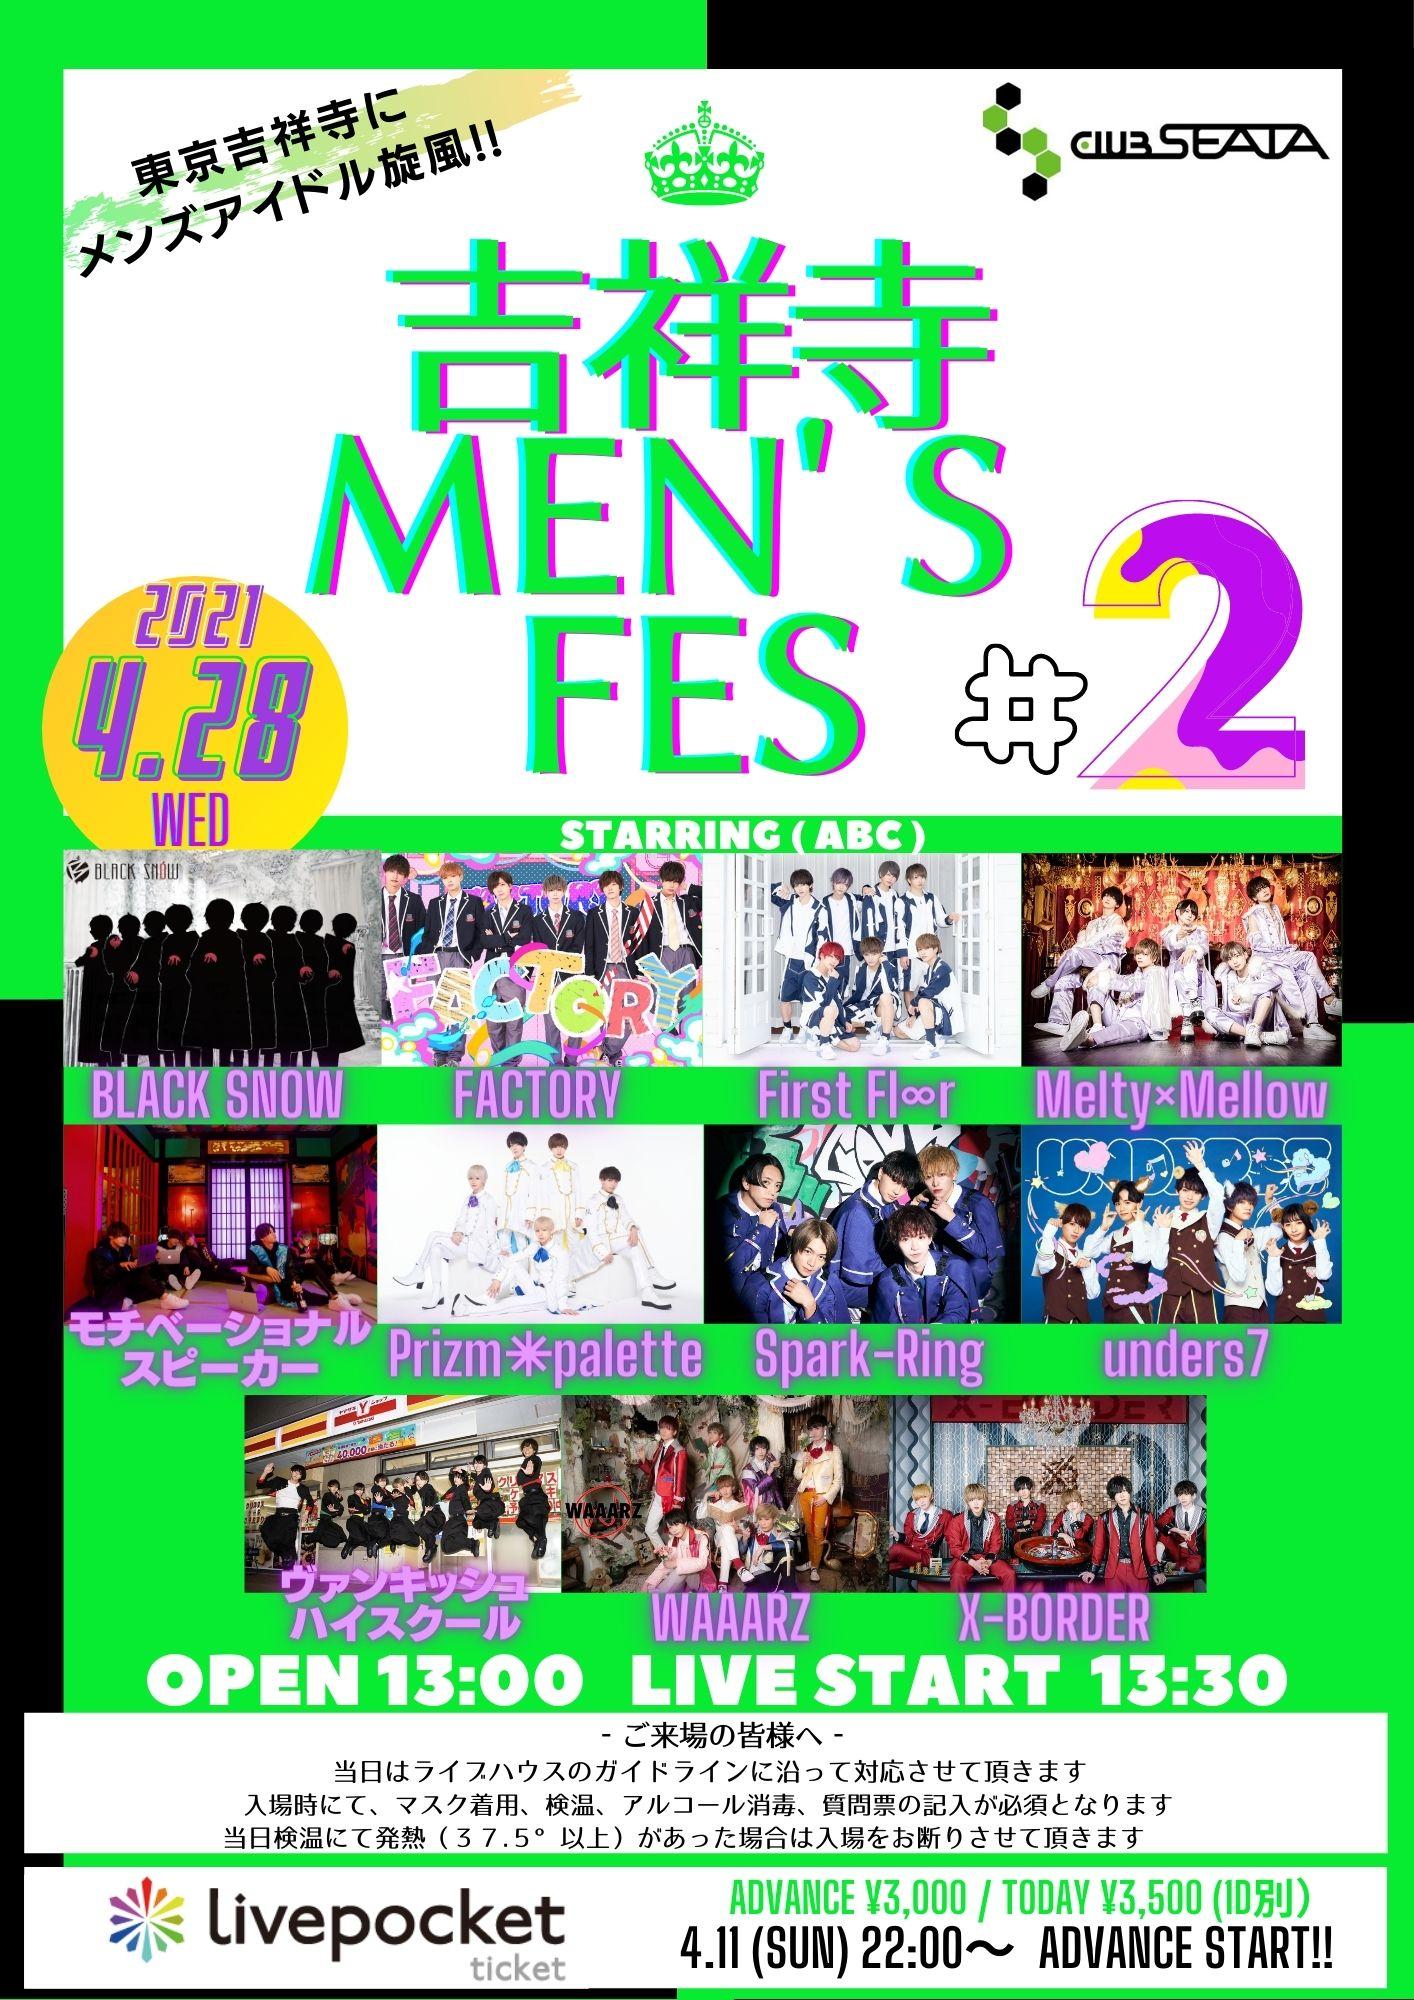 吉祥寺 Men's FES#2